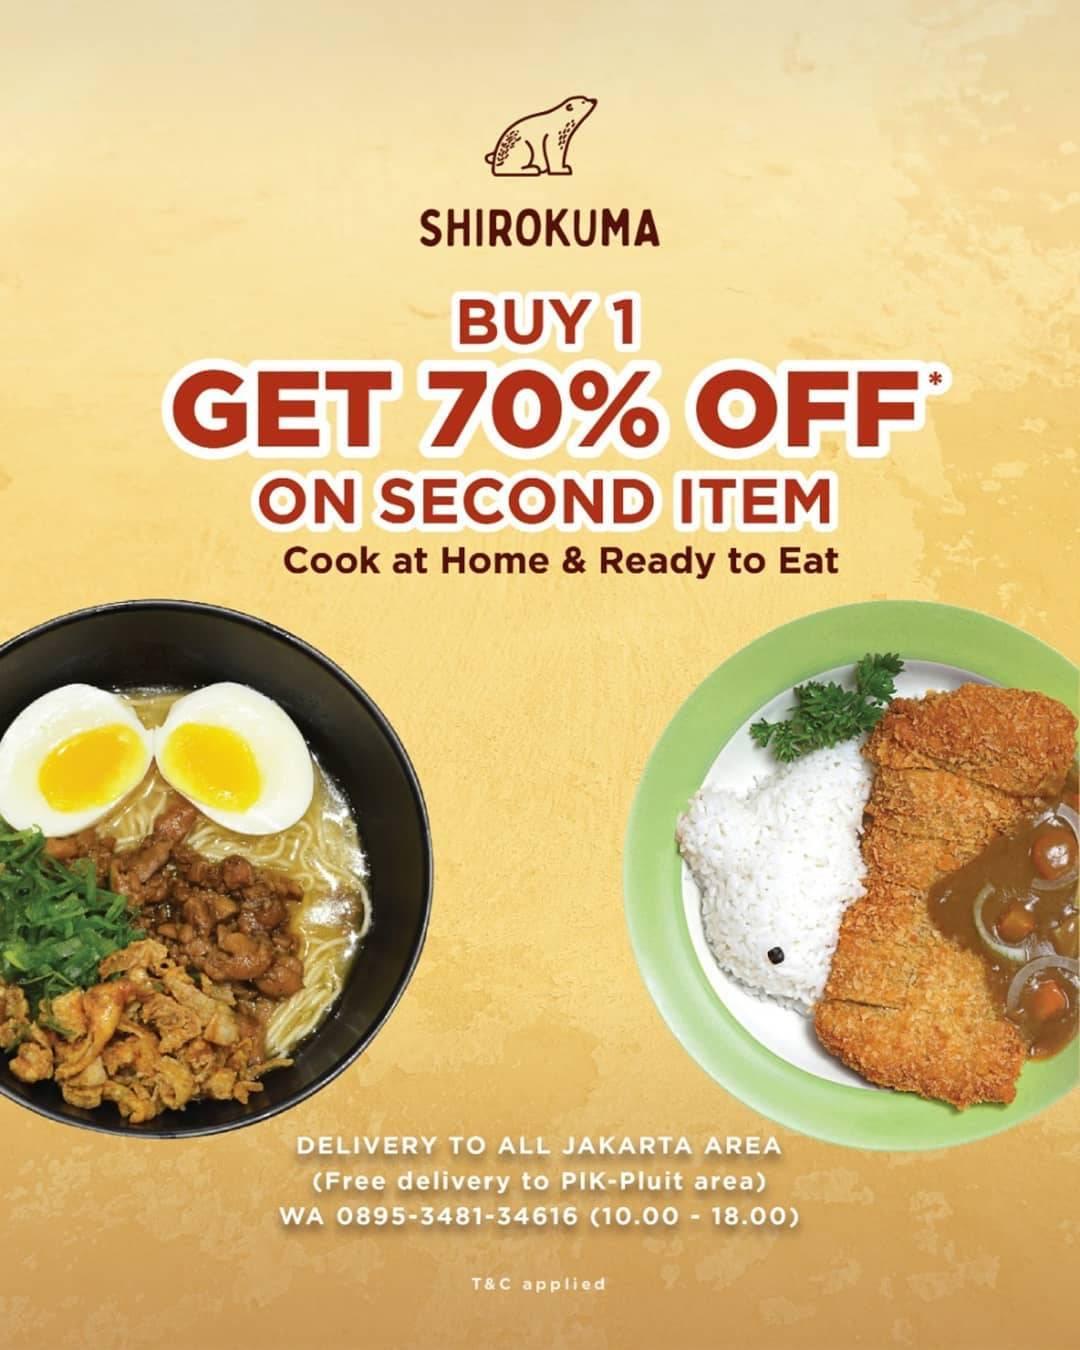 Diskon Cafe Shirokuma Promo Buy 1 Get 70% Off On Second Item For Selected Menu